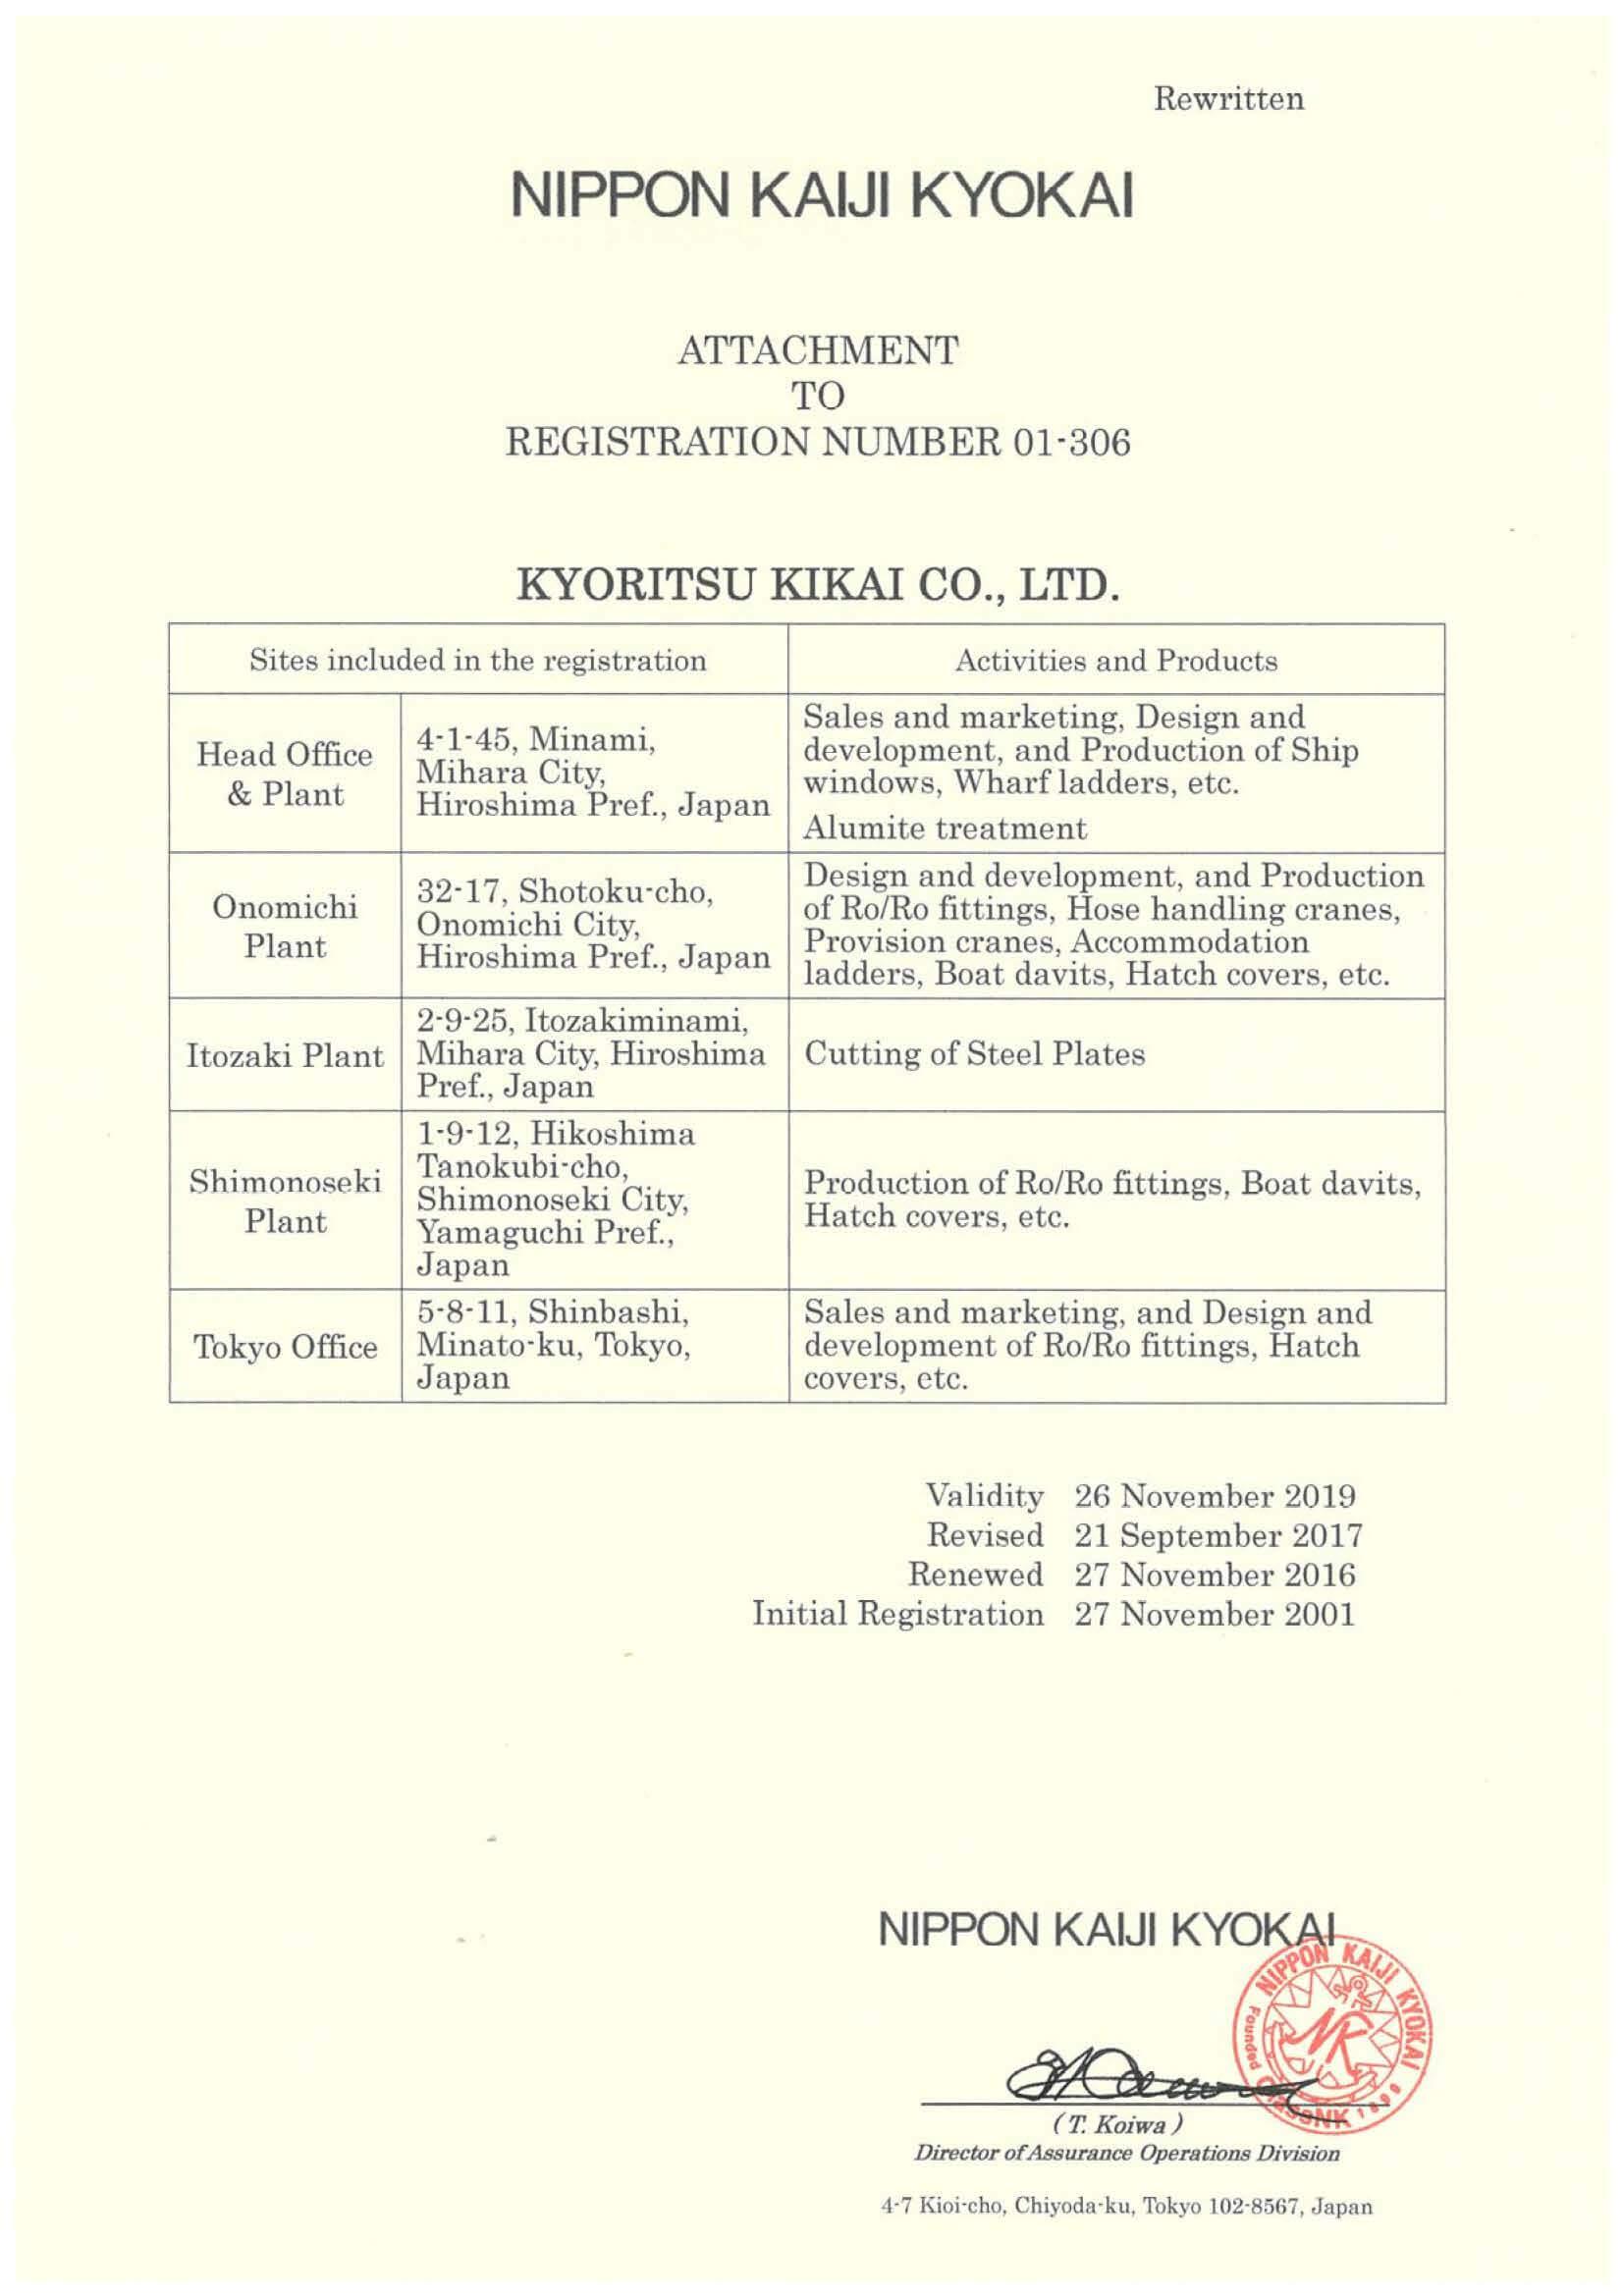 ISO品質マネジメント証書(2015年版)英文付属書